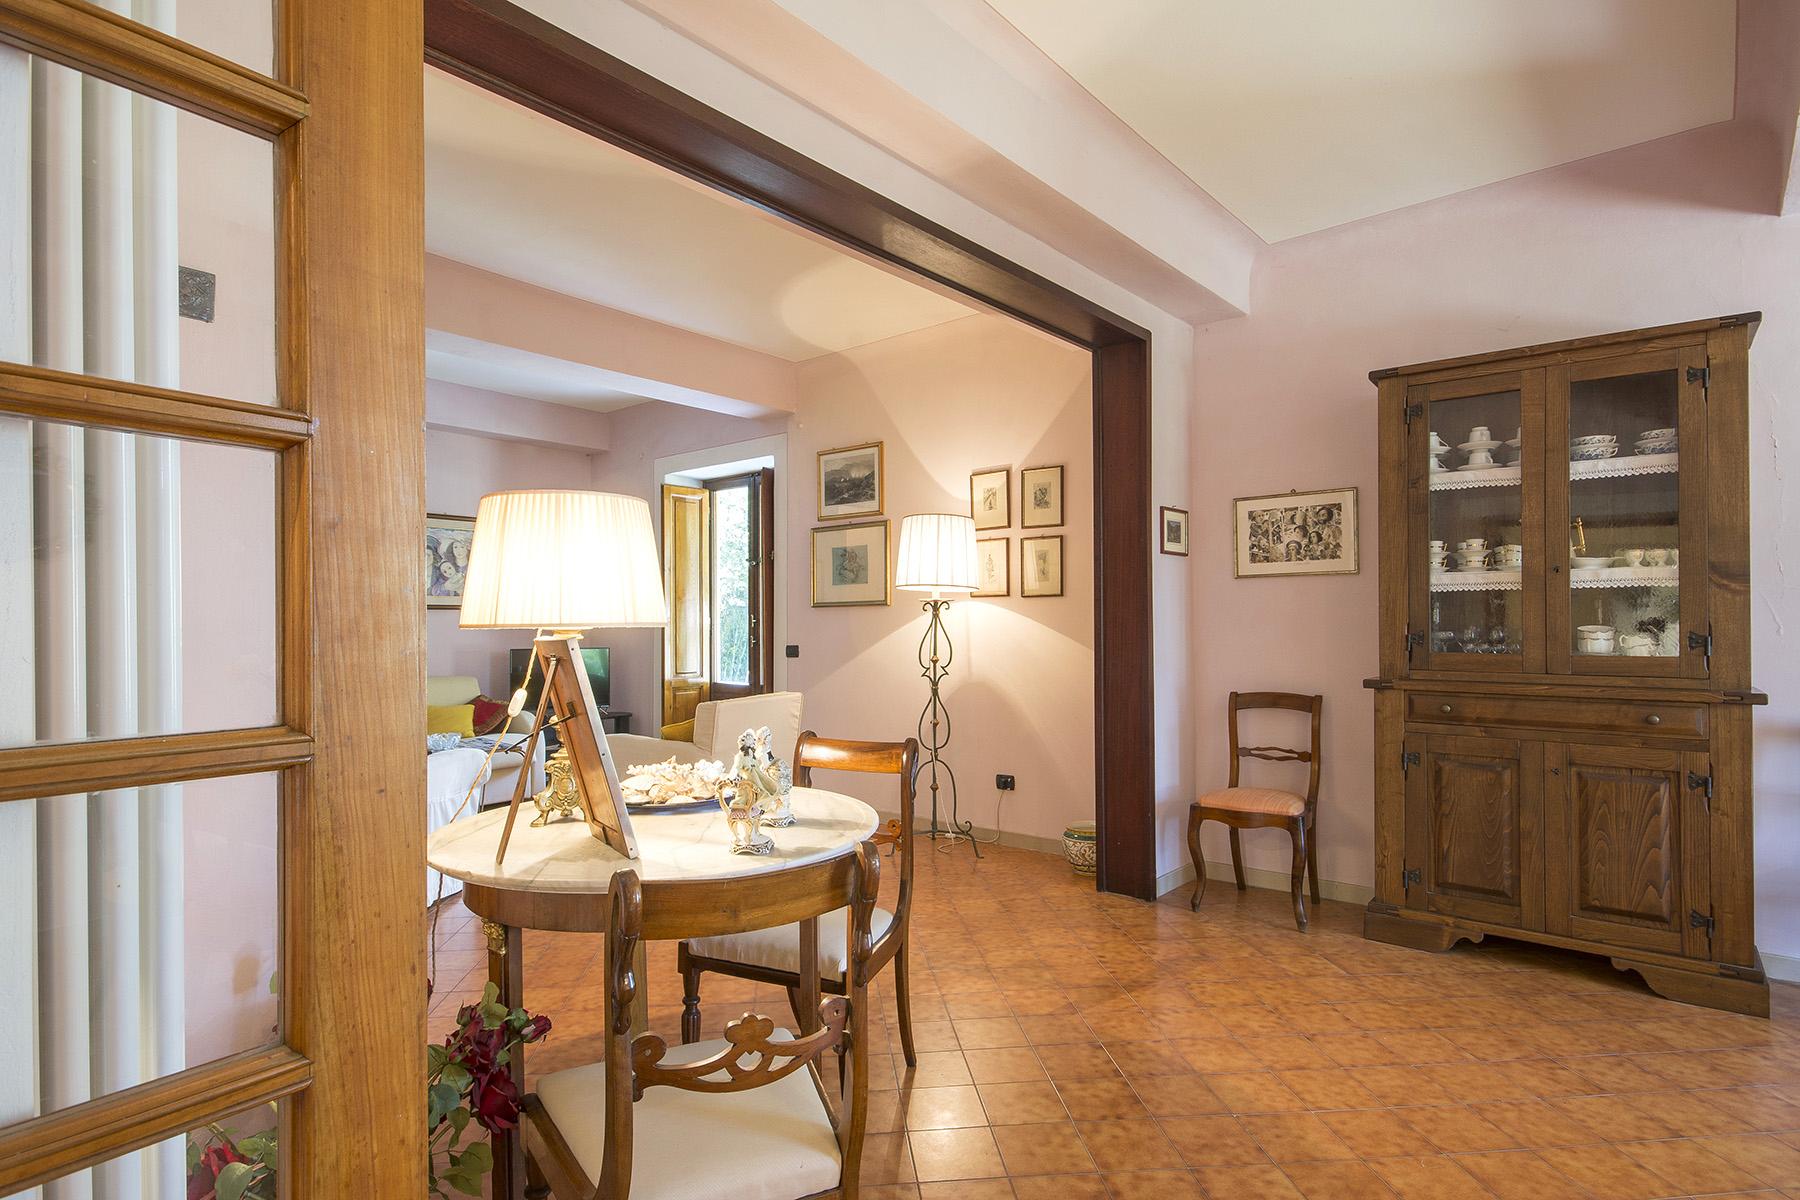 Villa in Vendita a Lucca: 5 locali, 1150 mq - Foto 16